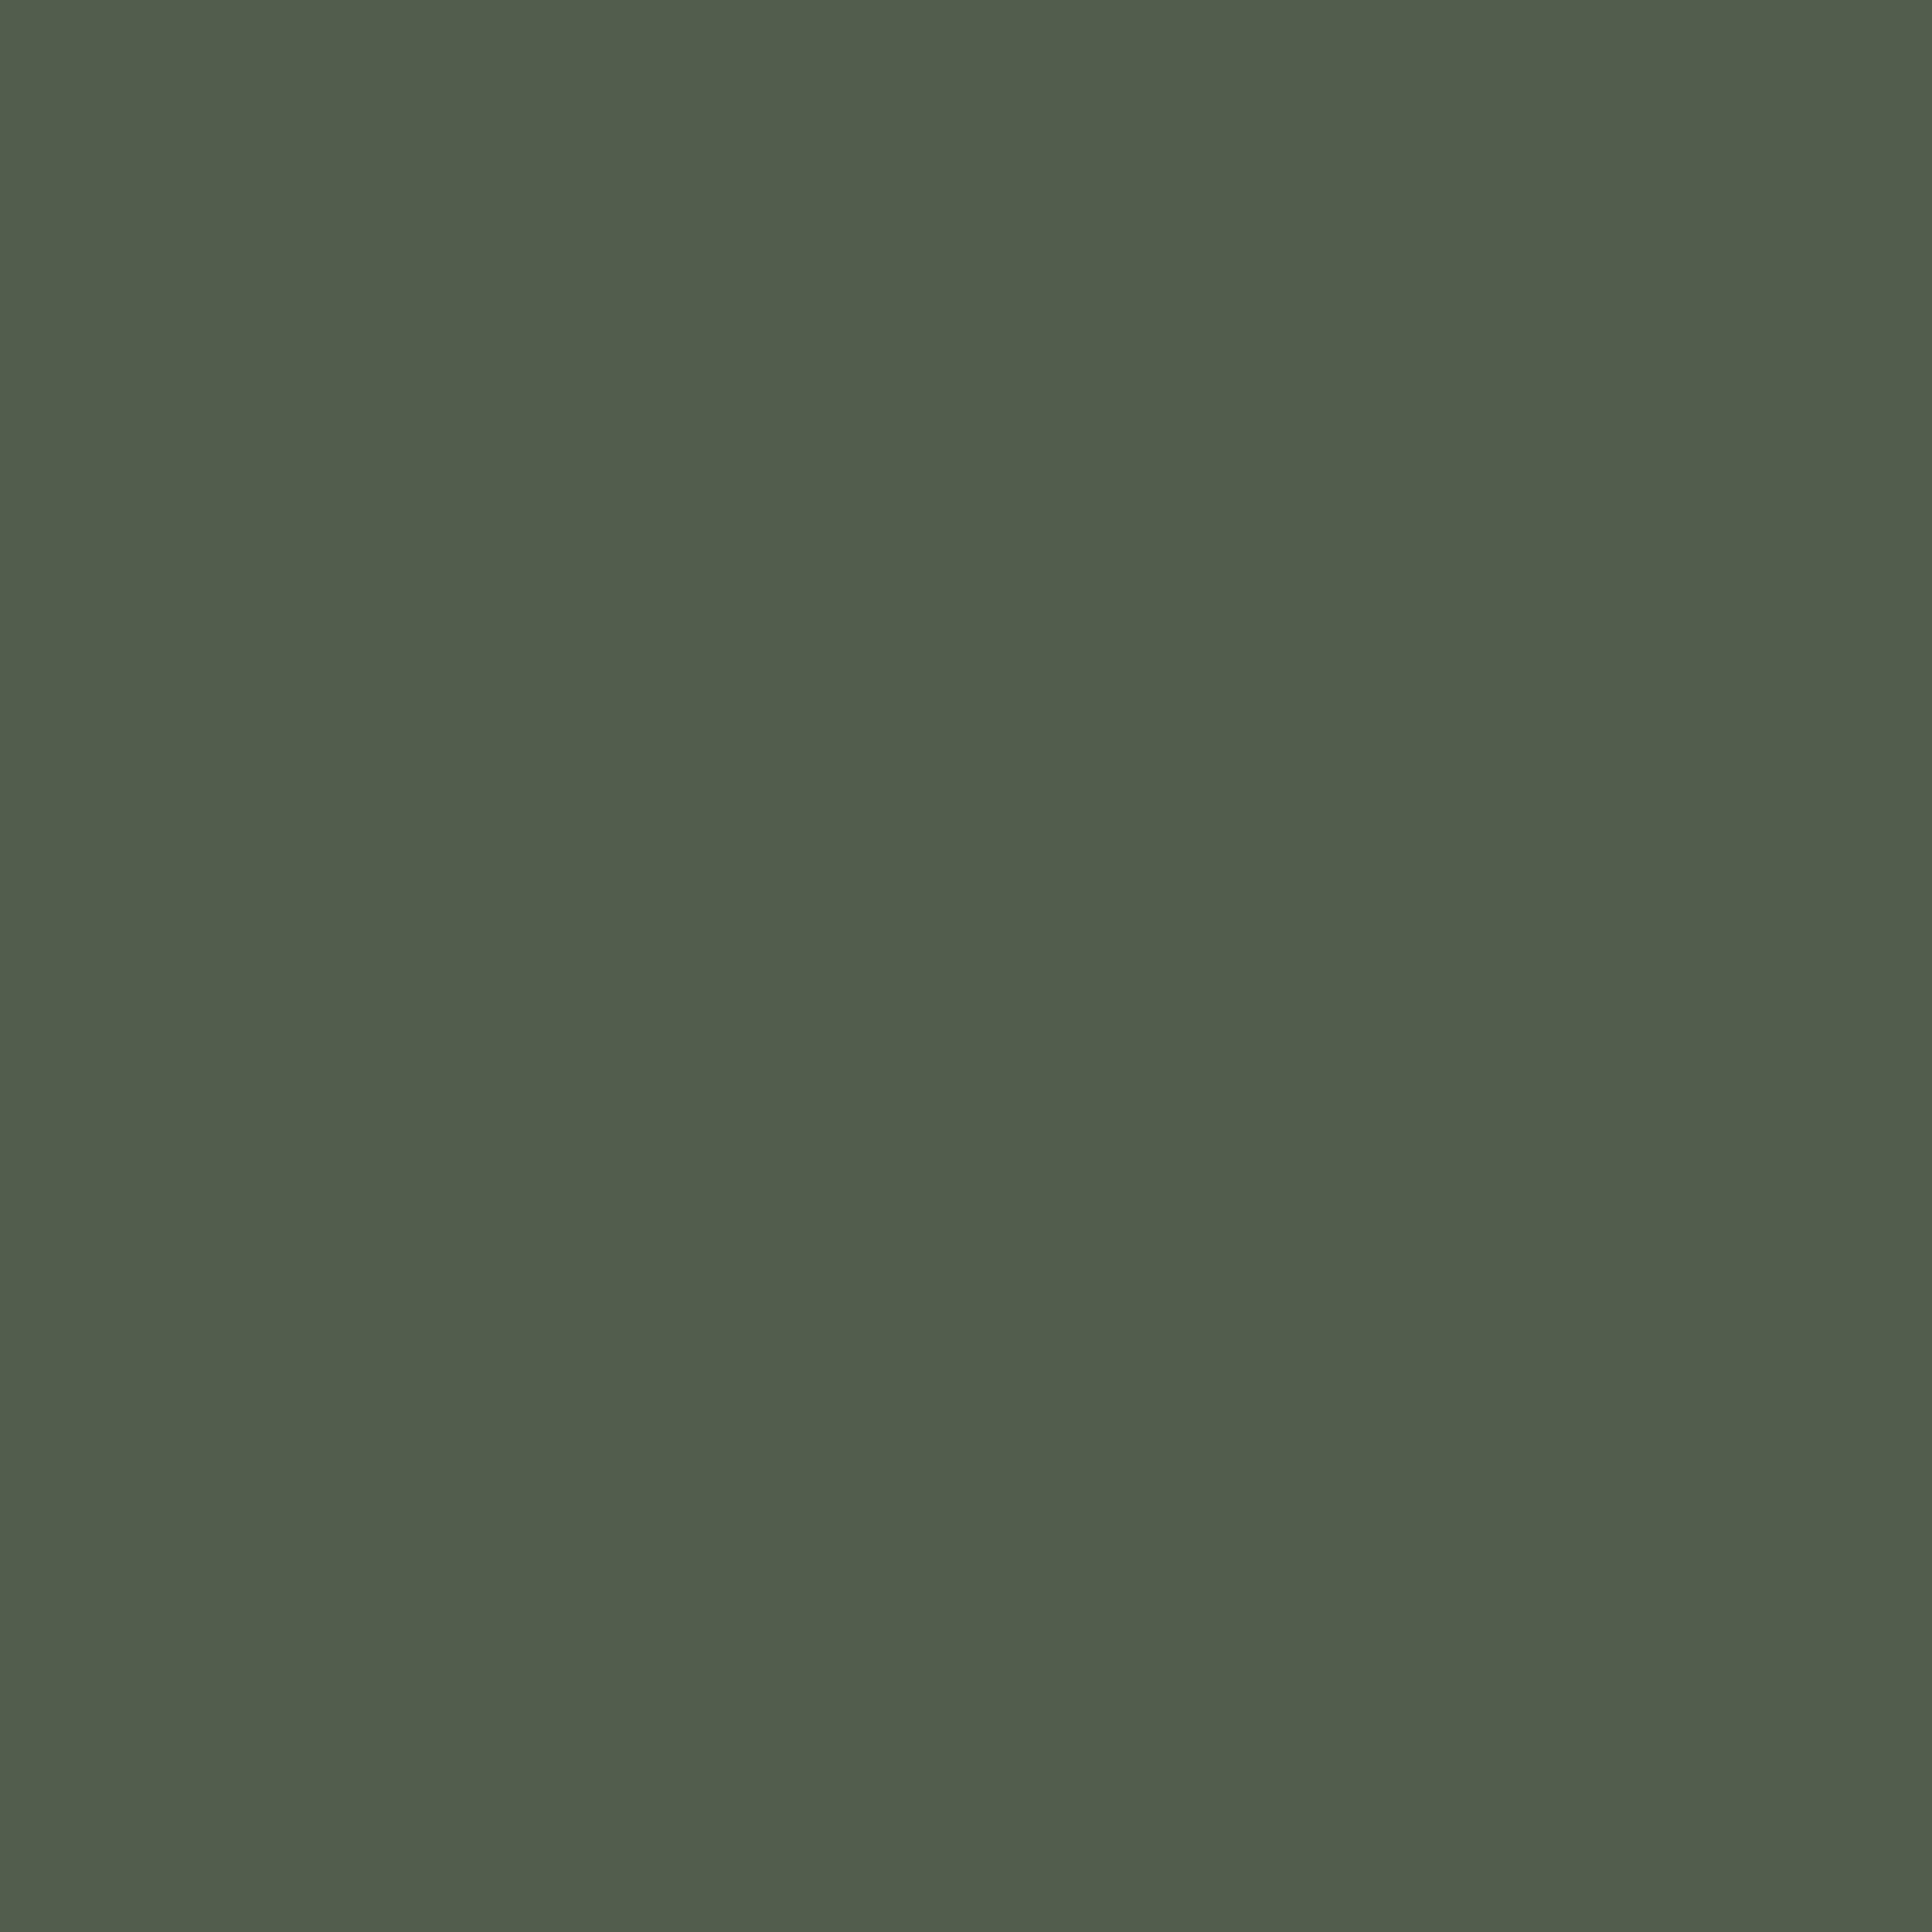 Oliv/neongelb